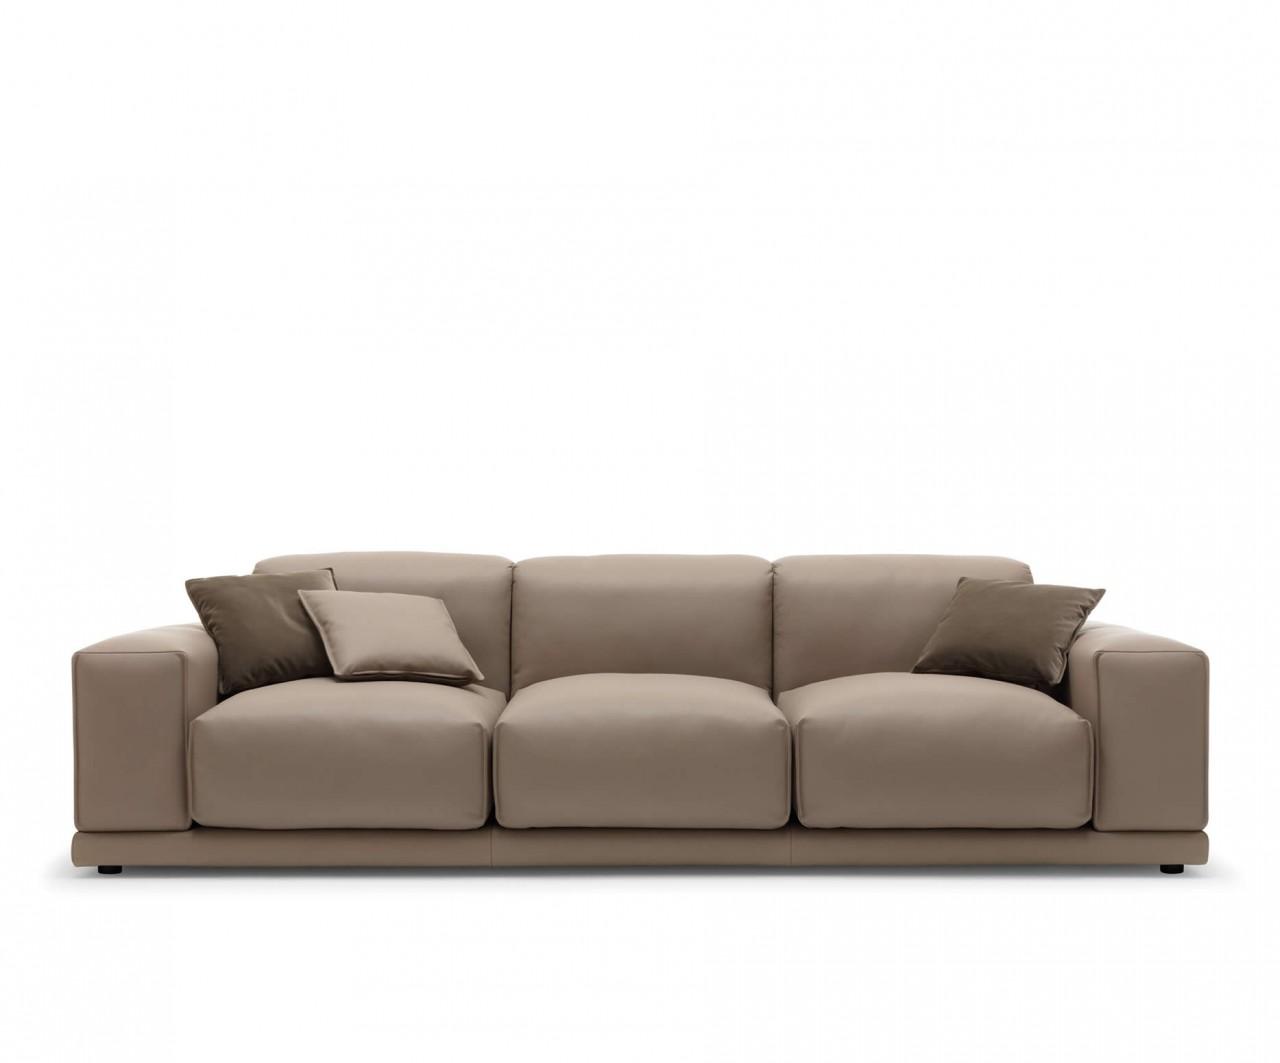 Rolf Benz MODO Sofa | Drifte Onlineshop